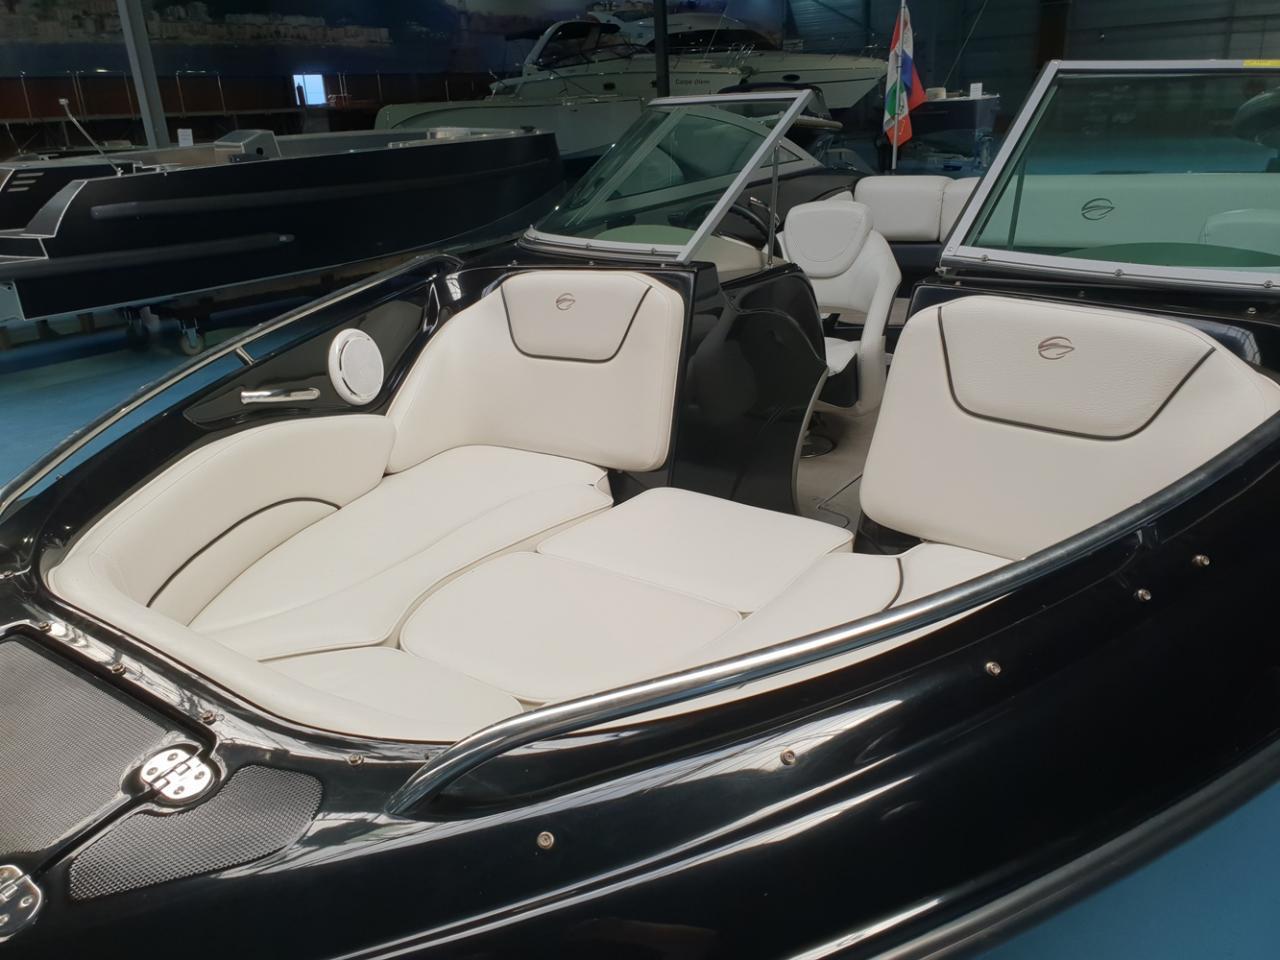 Crownline 220 met Mercruiser 5 liter V8 260 pk 3